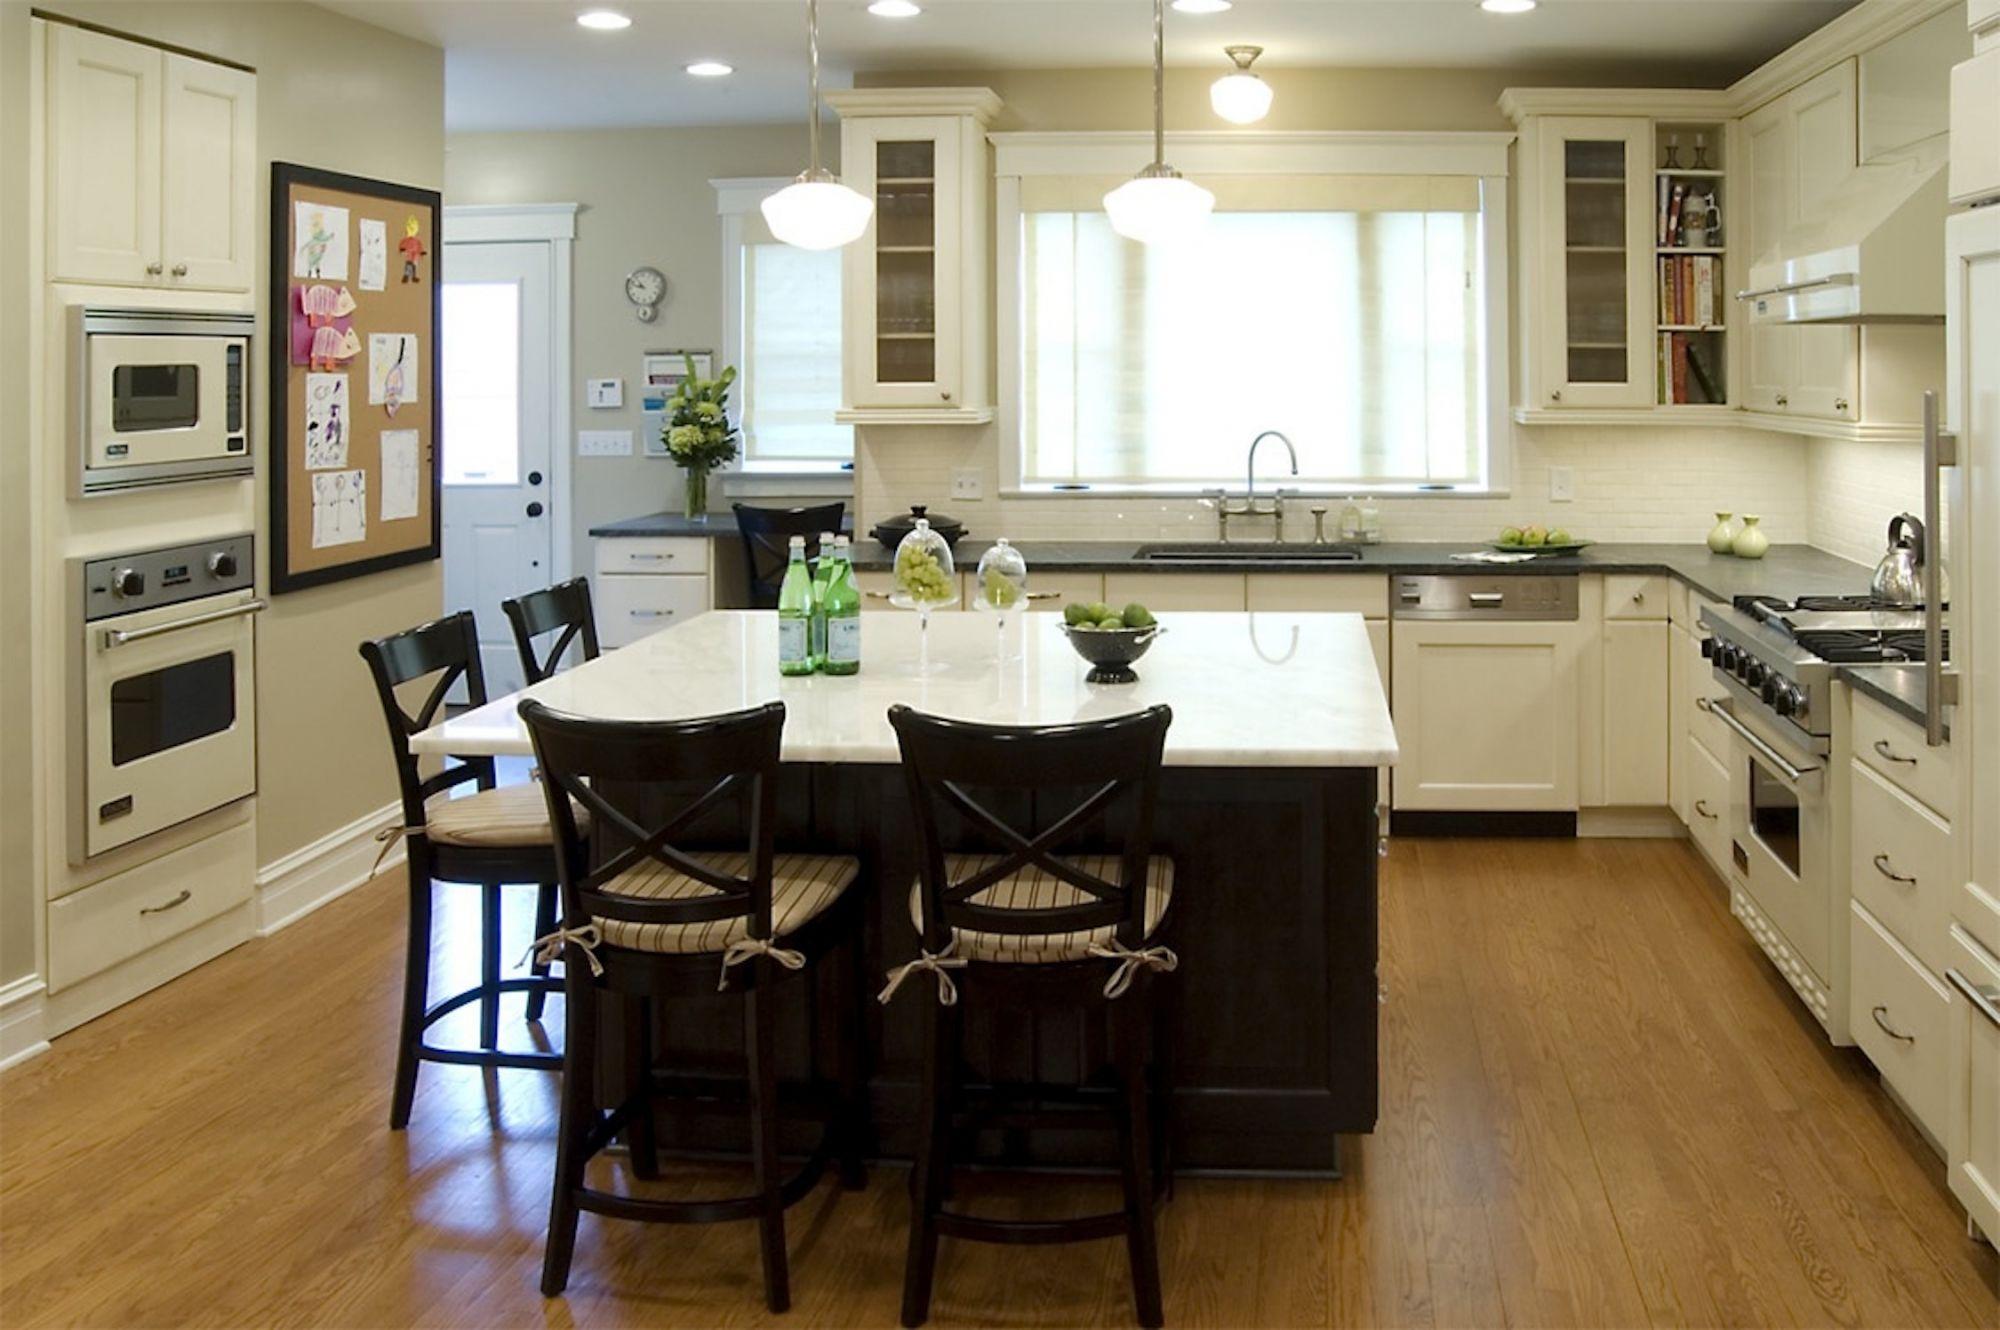 Two Sided Seating Luxury Kitchen Design Kitchen Island